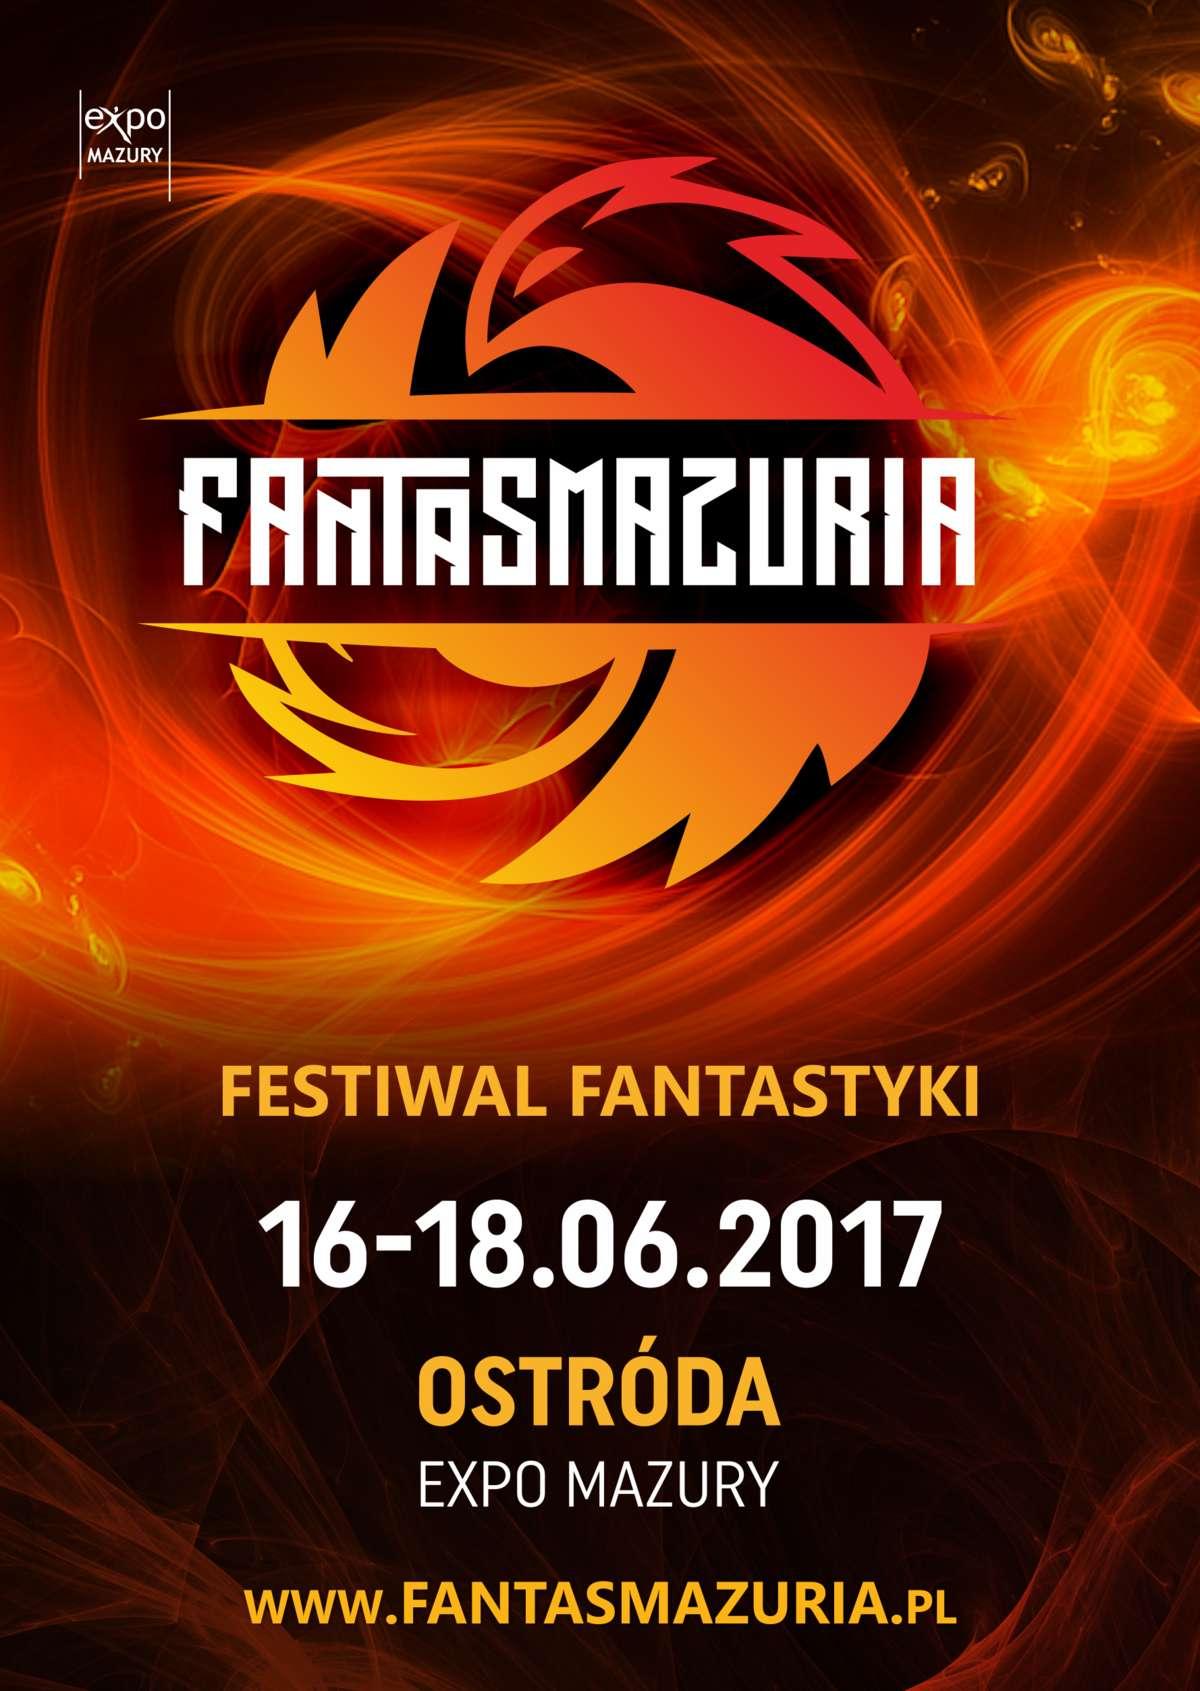 Festiwal fantastyki Fantasmazuria w Ostródzie - full image